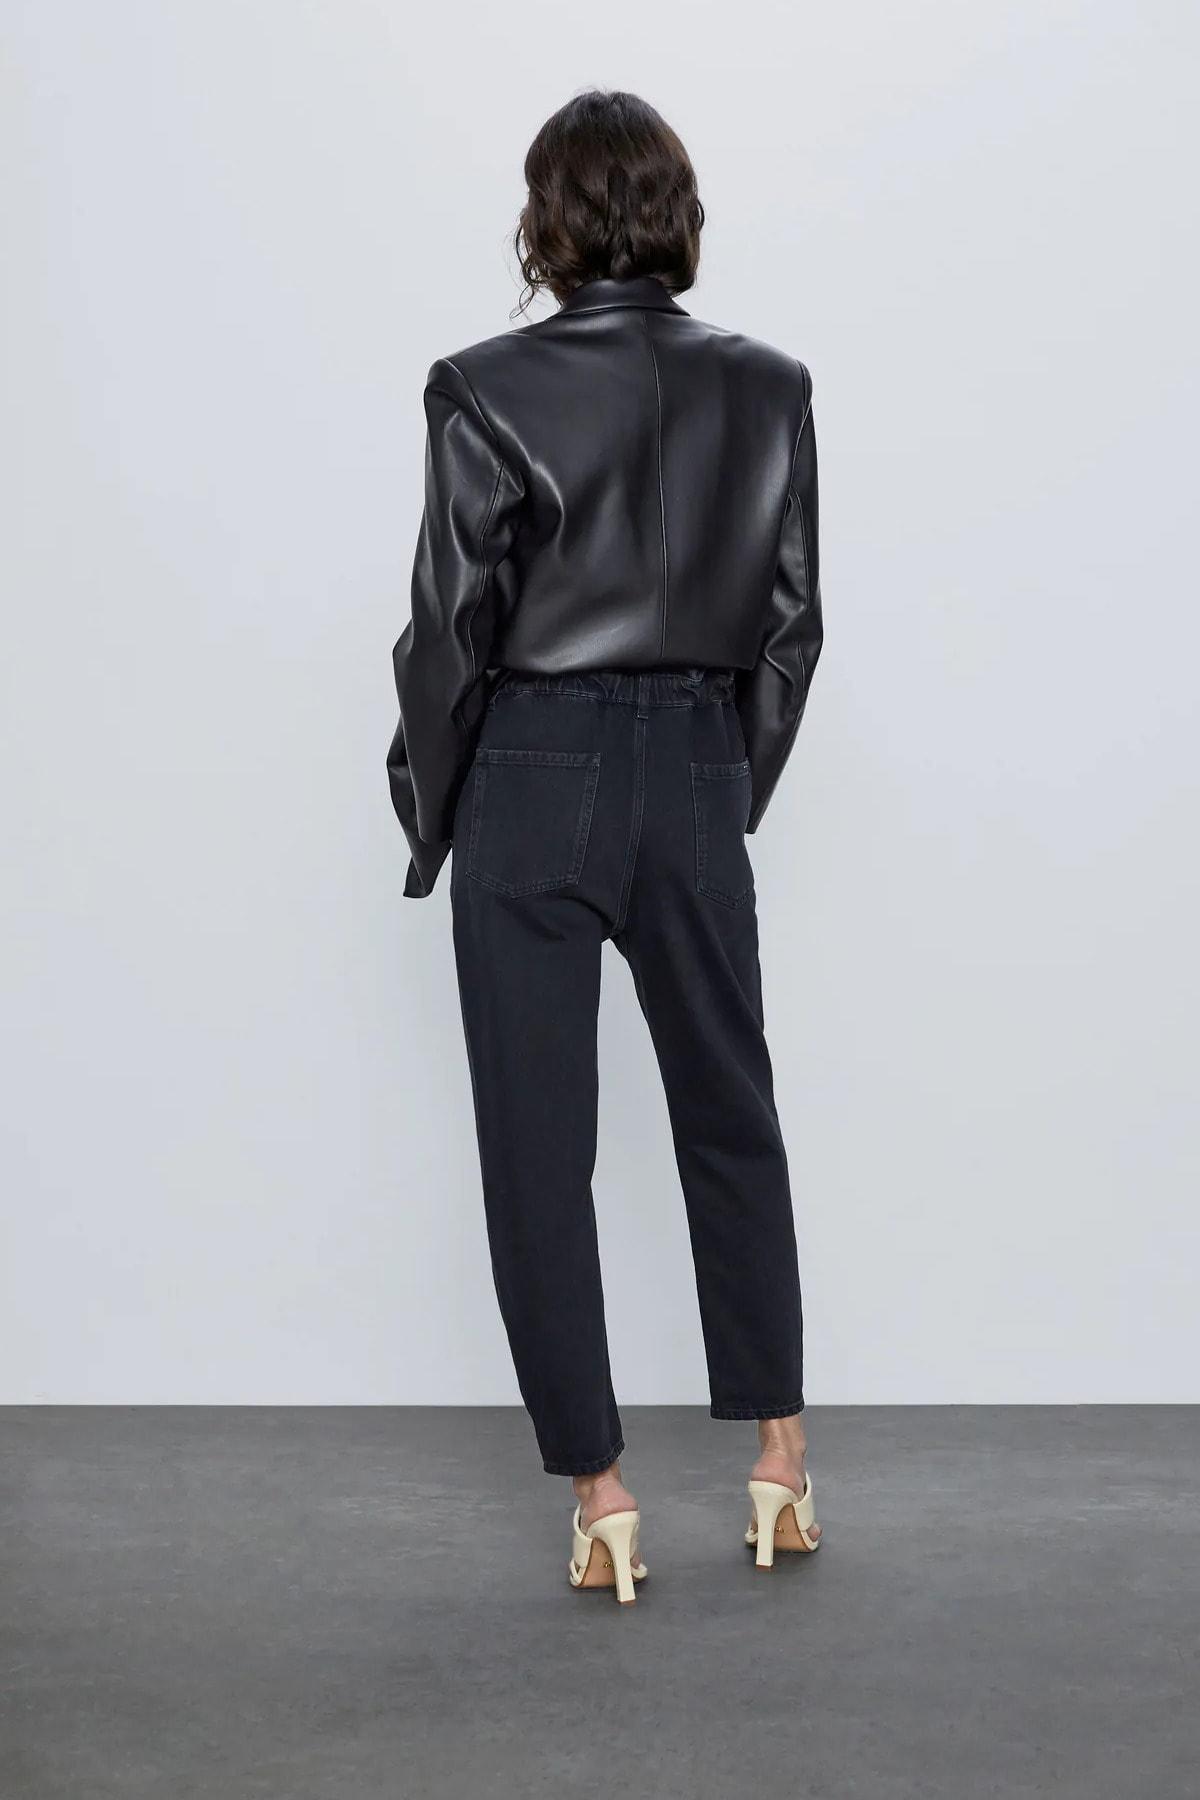 Beyaz Giyim Moda Kadın Siyah Paperbag Jeans Yüksek Bel Kot Pantolon 2